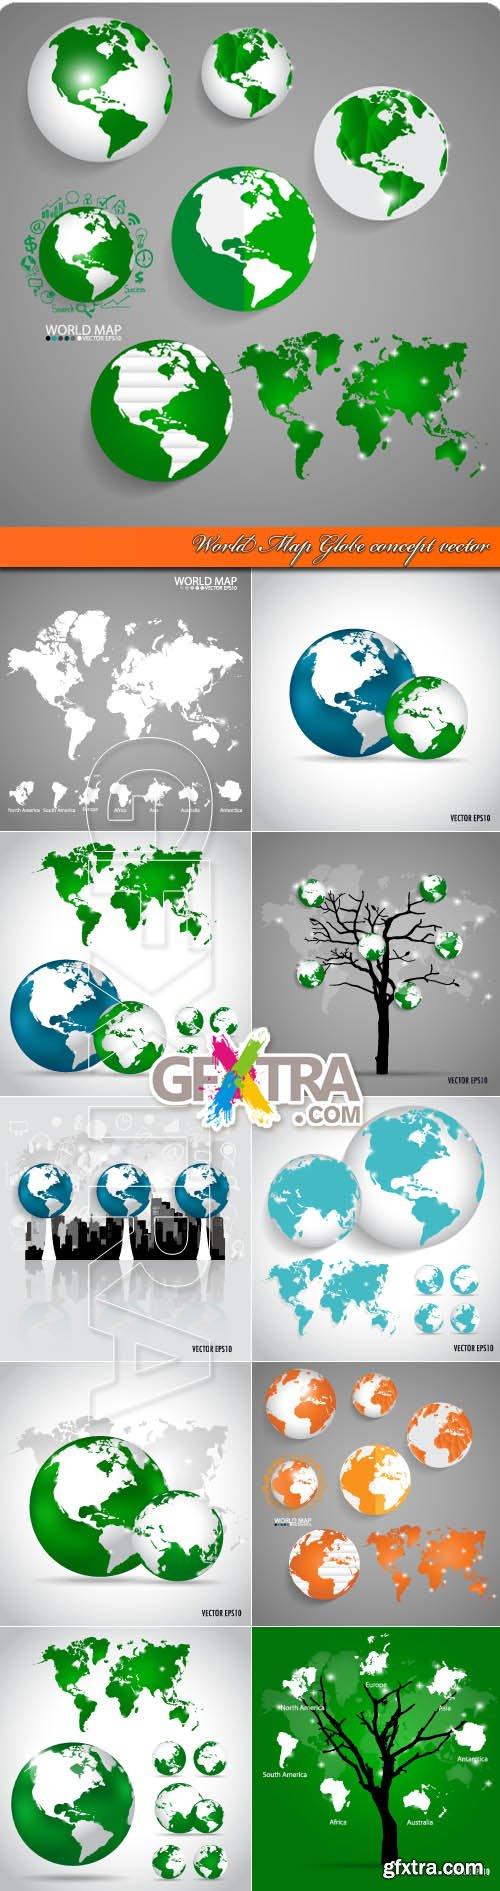 World Map Globe concept vector